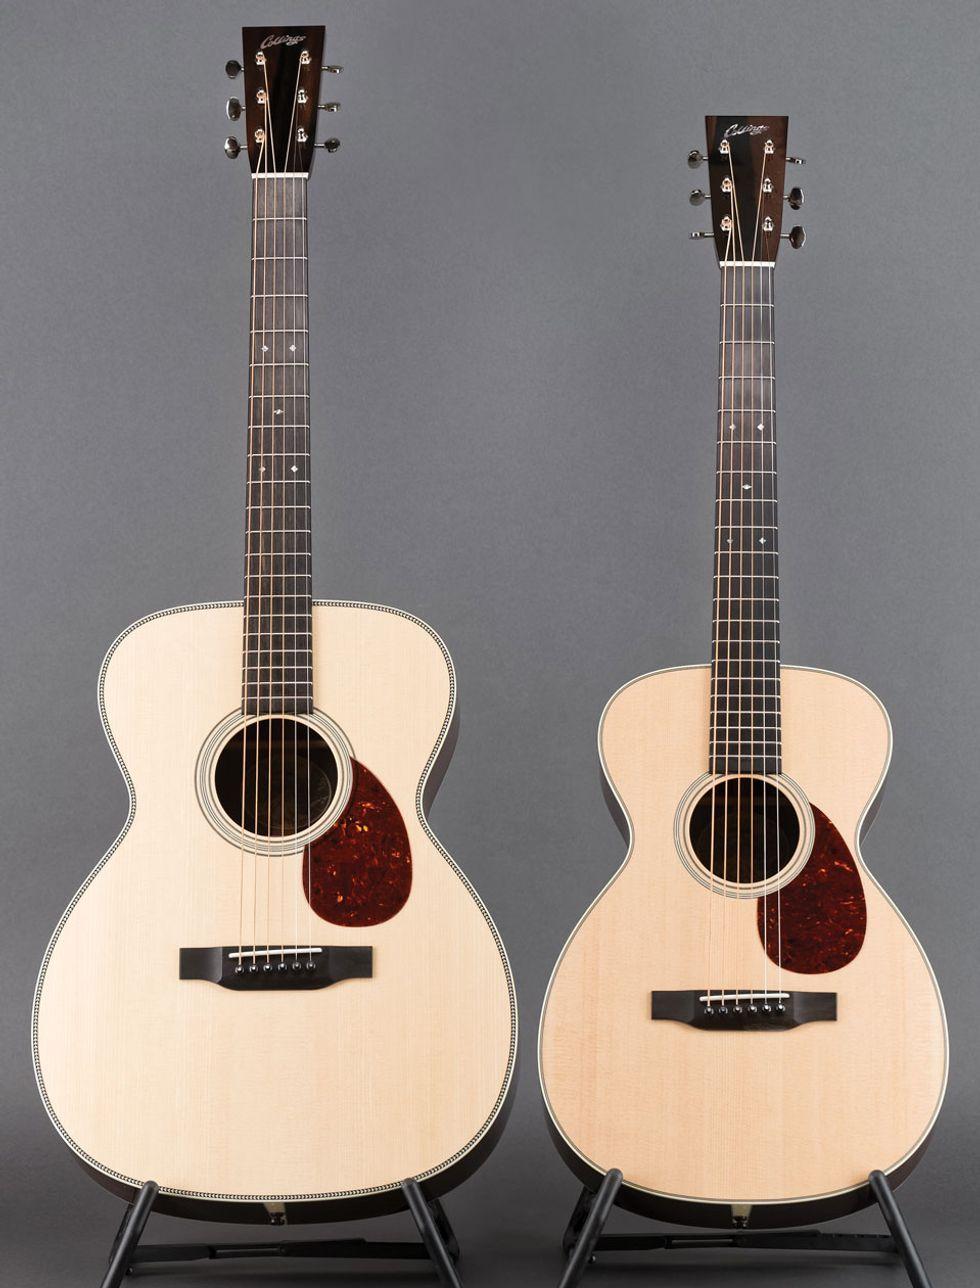 Acoustic Soundboard: Honey, I Shrunk the Guitar   Premier Guitar